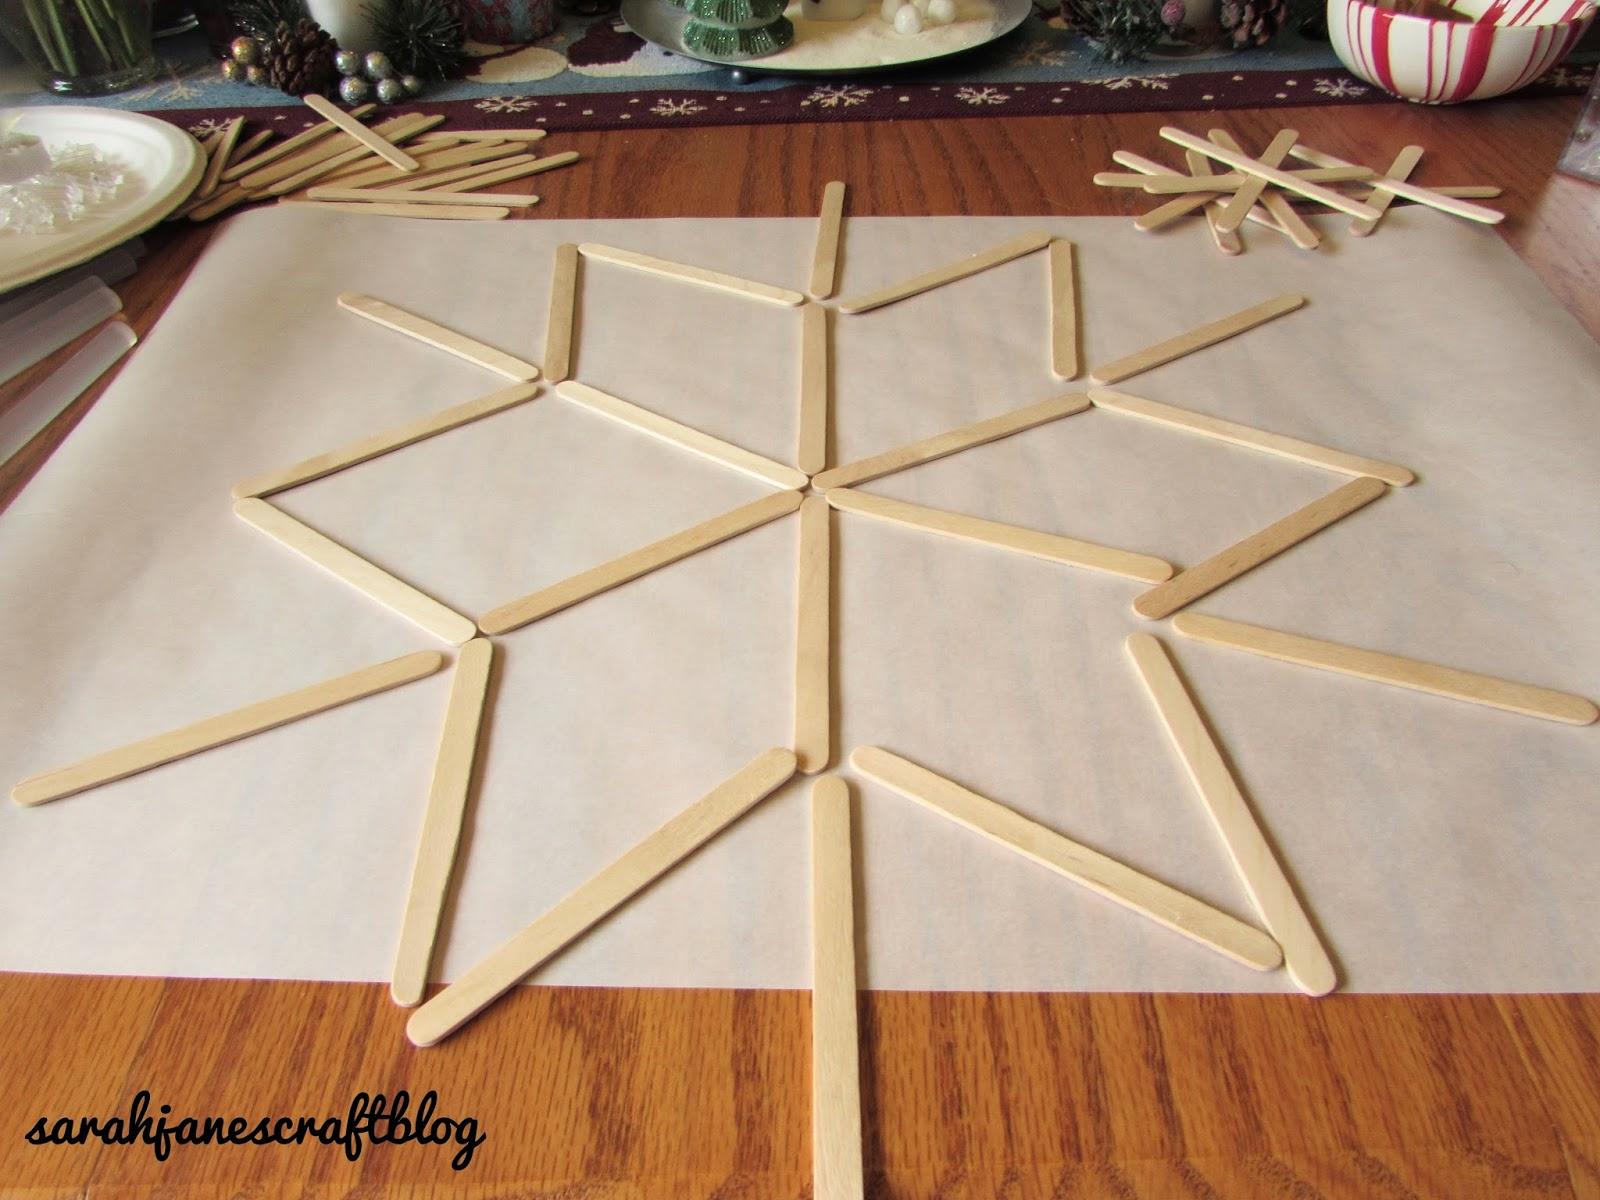 Sarah Jane's Craft Blog: Craft Popsicle Stick Snowflake ...